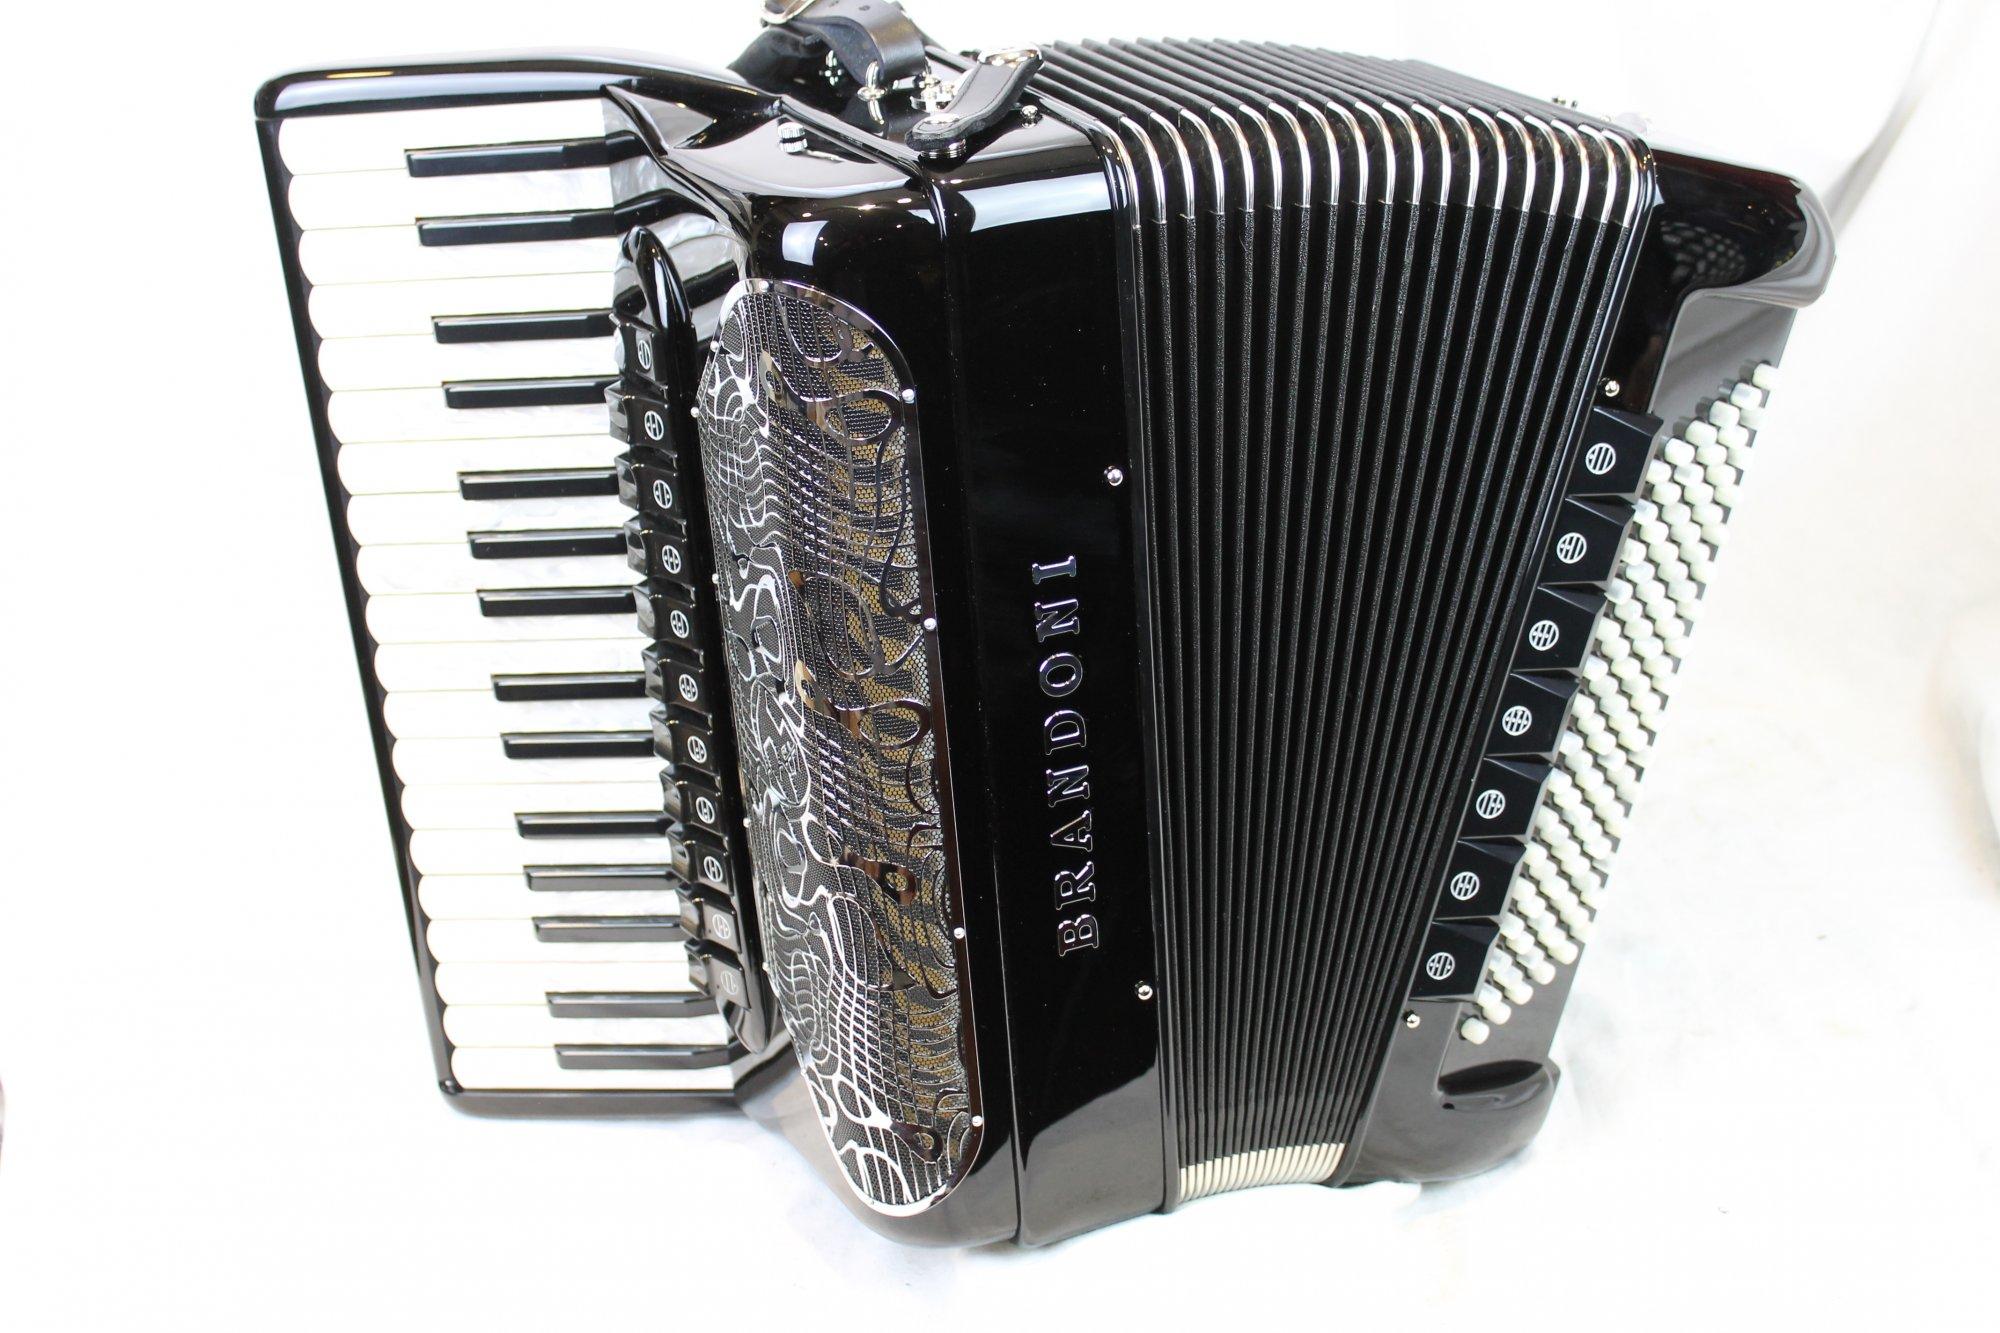 NEW Black Brandoni 68C Infinity Piano Accordion LMMH 34 96